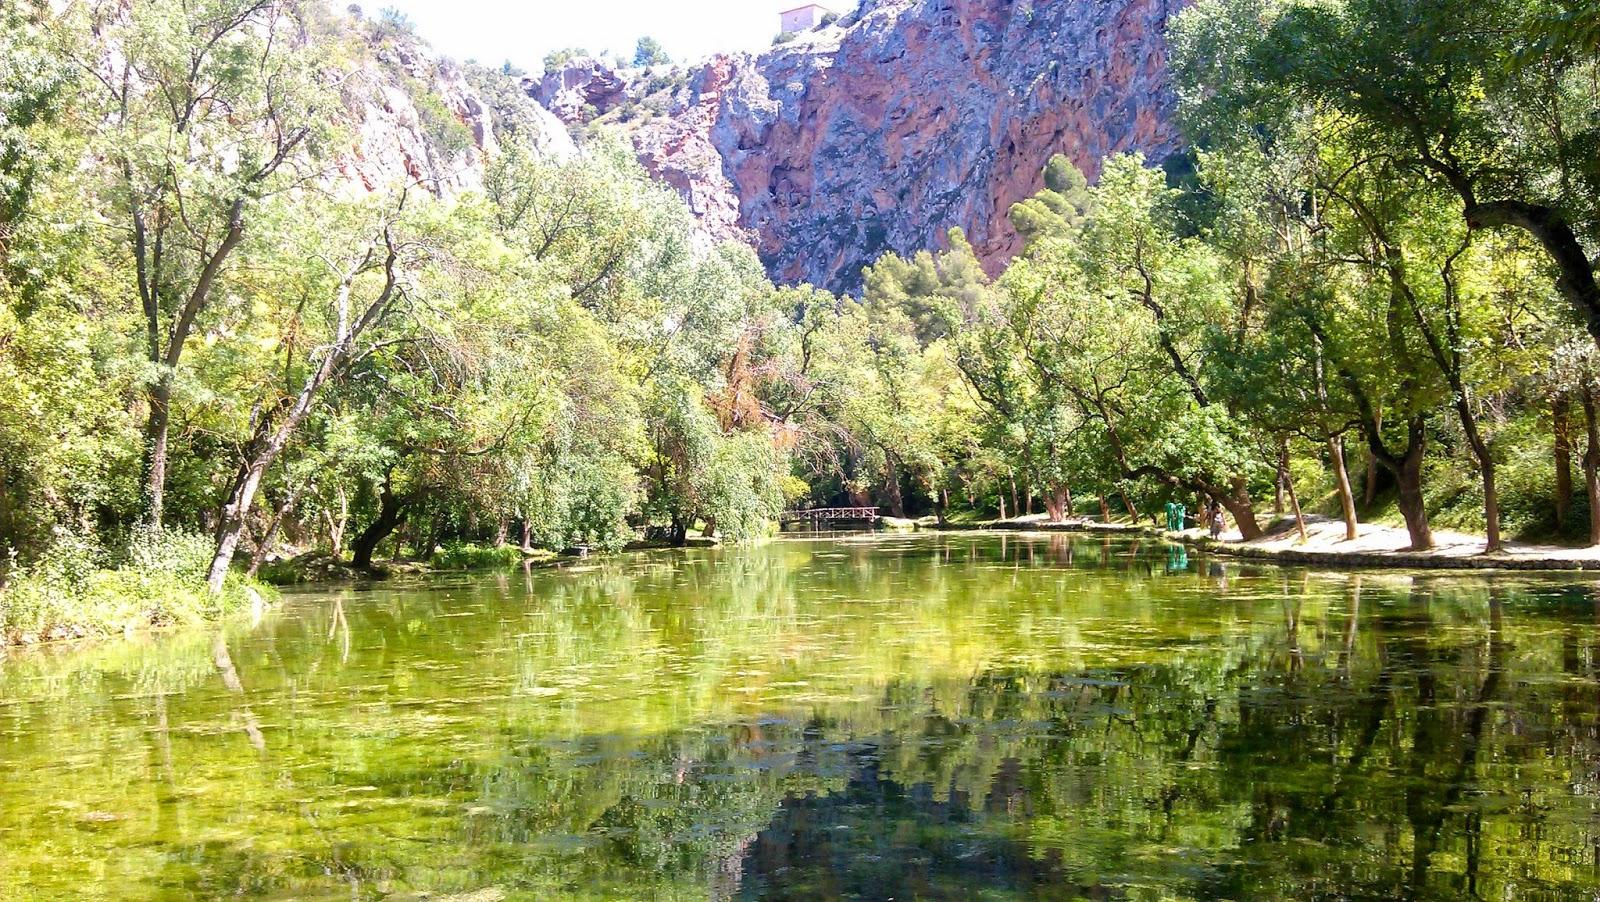 Lago del Espejo. Guía de turismo del Monasterio de Piedra. Tu Maleta.